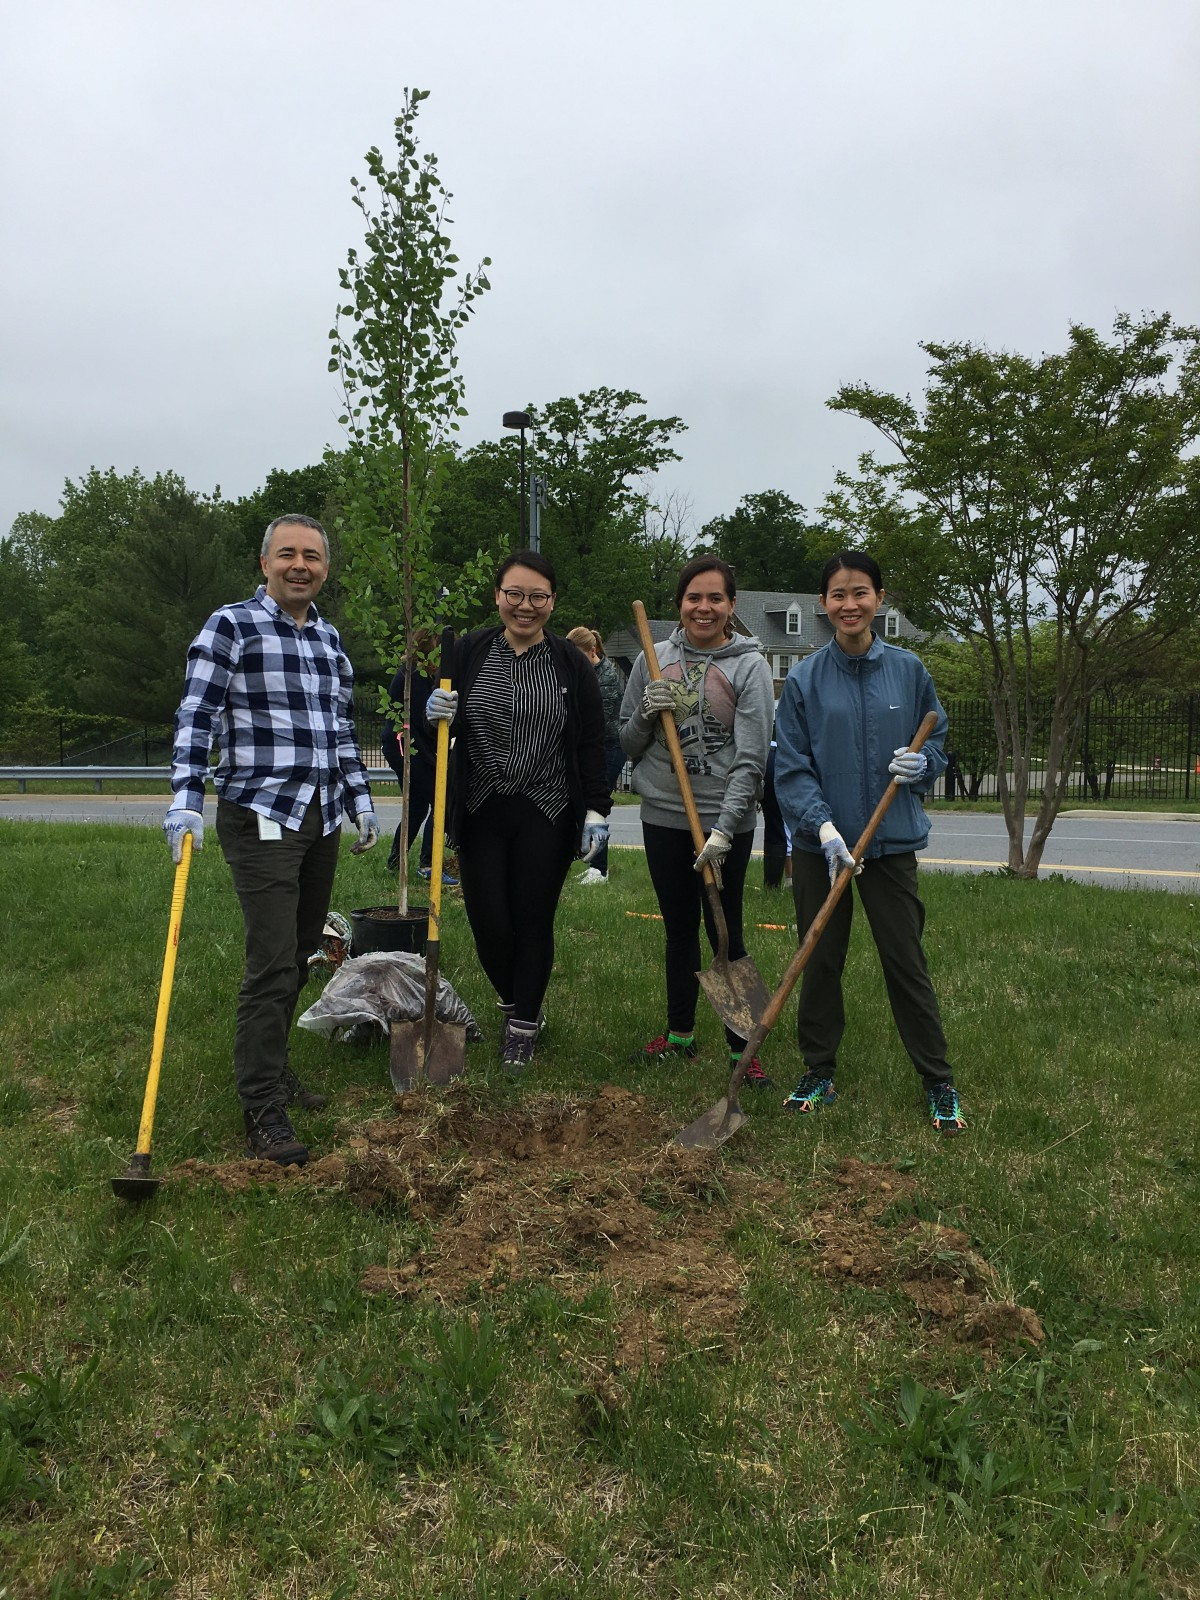 9-11am Fairmount Heights Community Planting Day